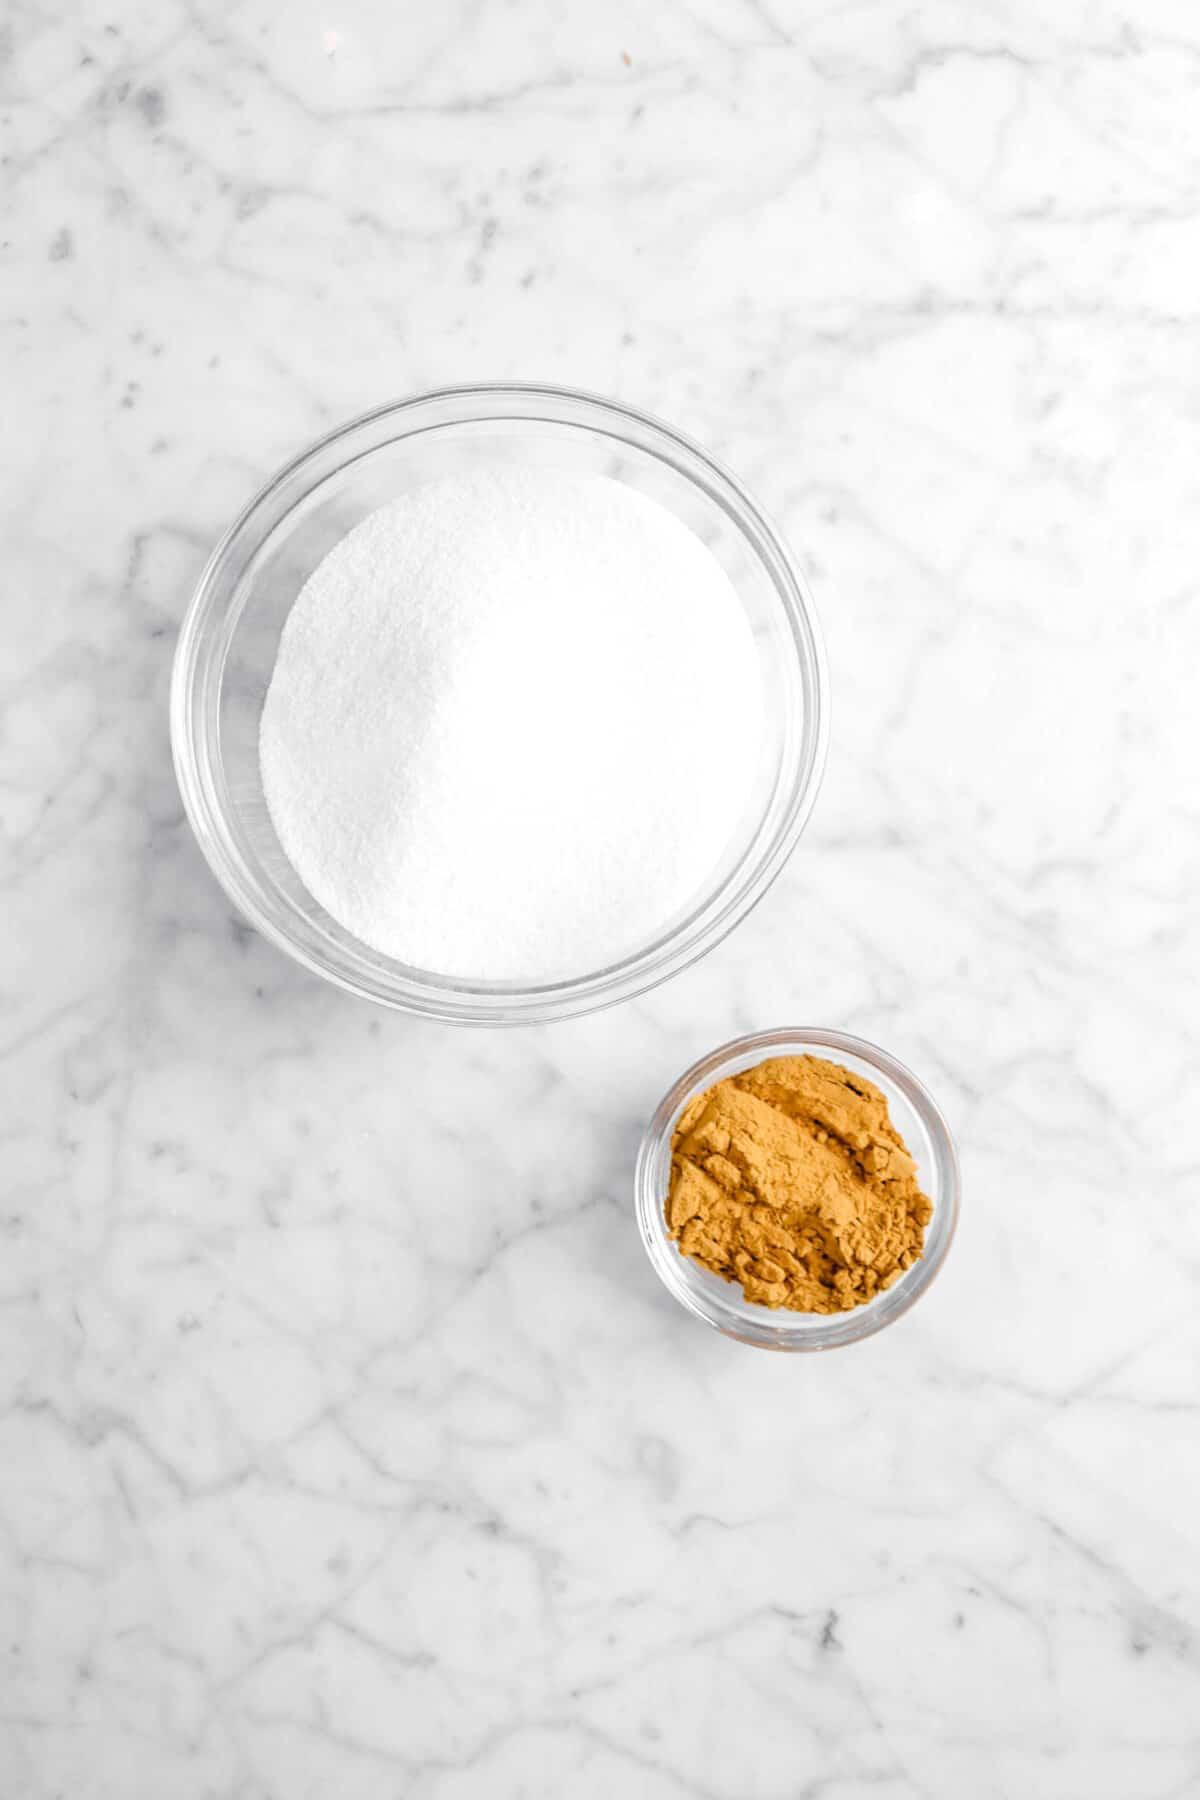 sugar and cinnamon in glass bowls